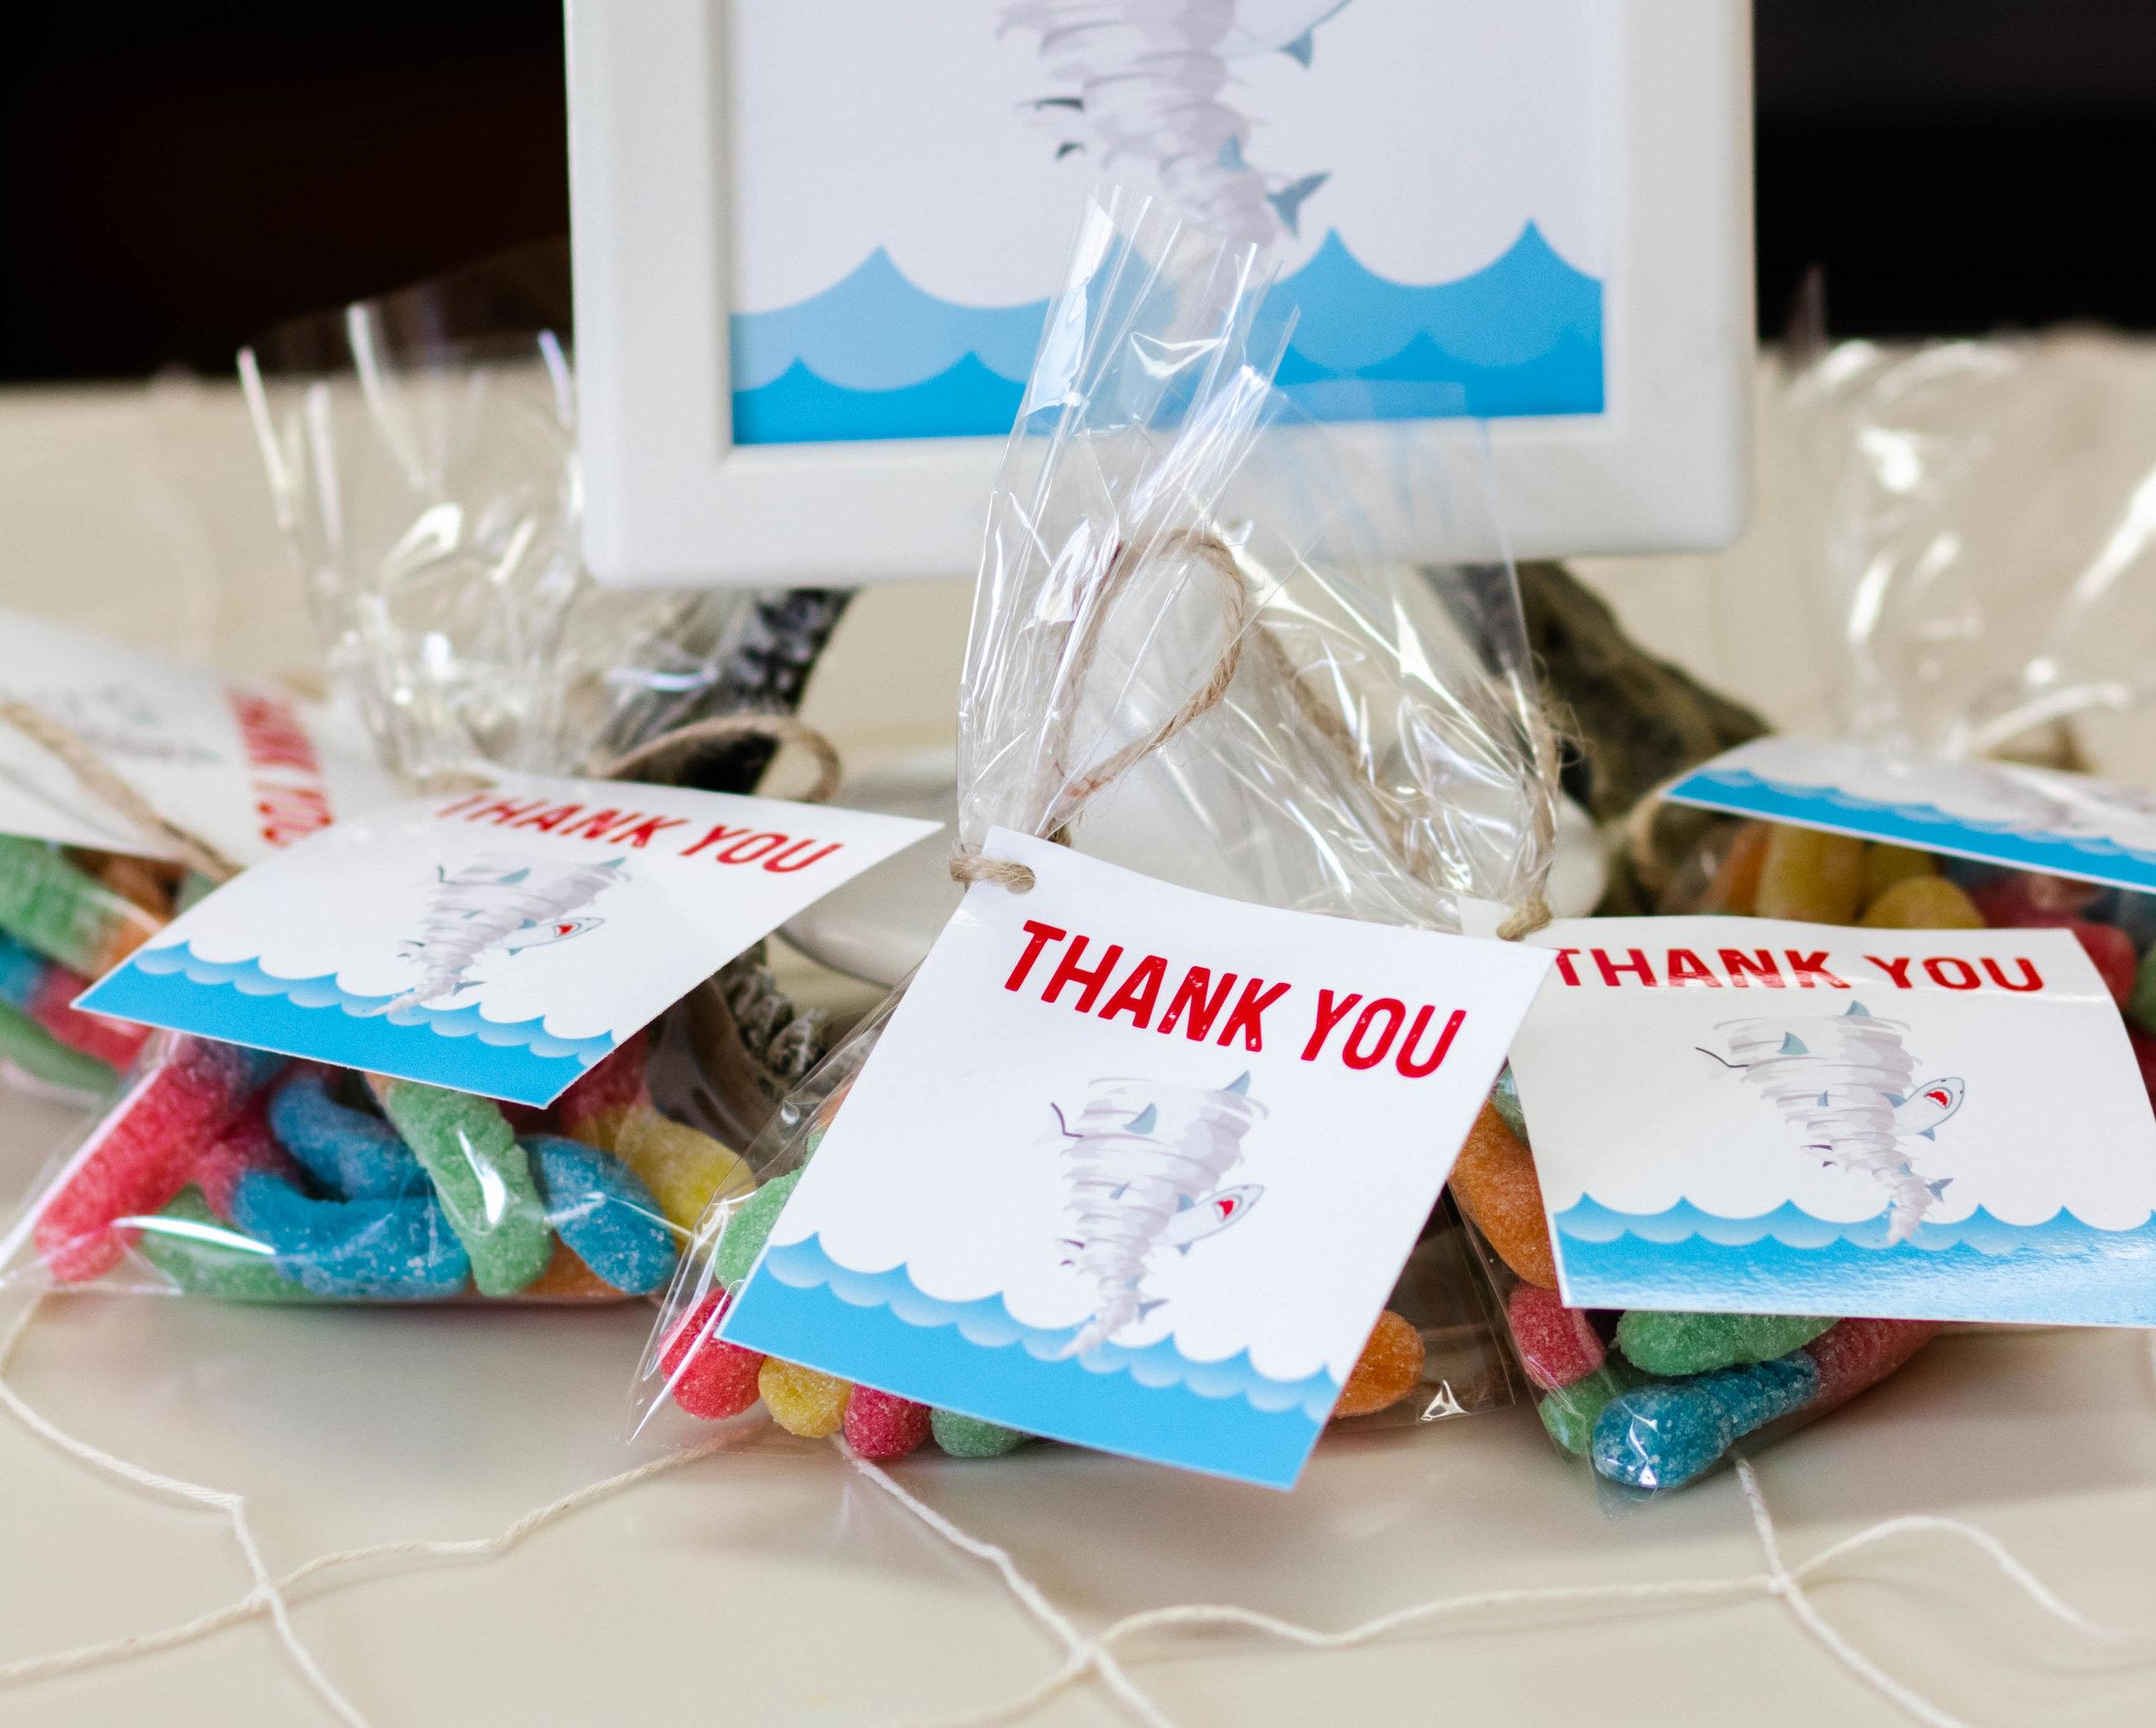 Free Printable thank you tags // Shark Party Decor - Sharknado Birthday Party Ideas // mkkmdesigns